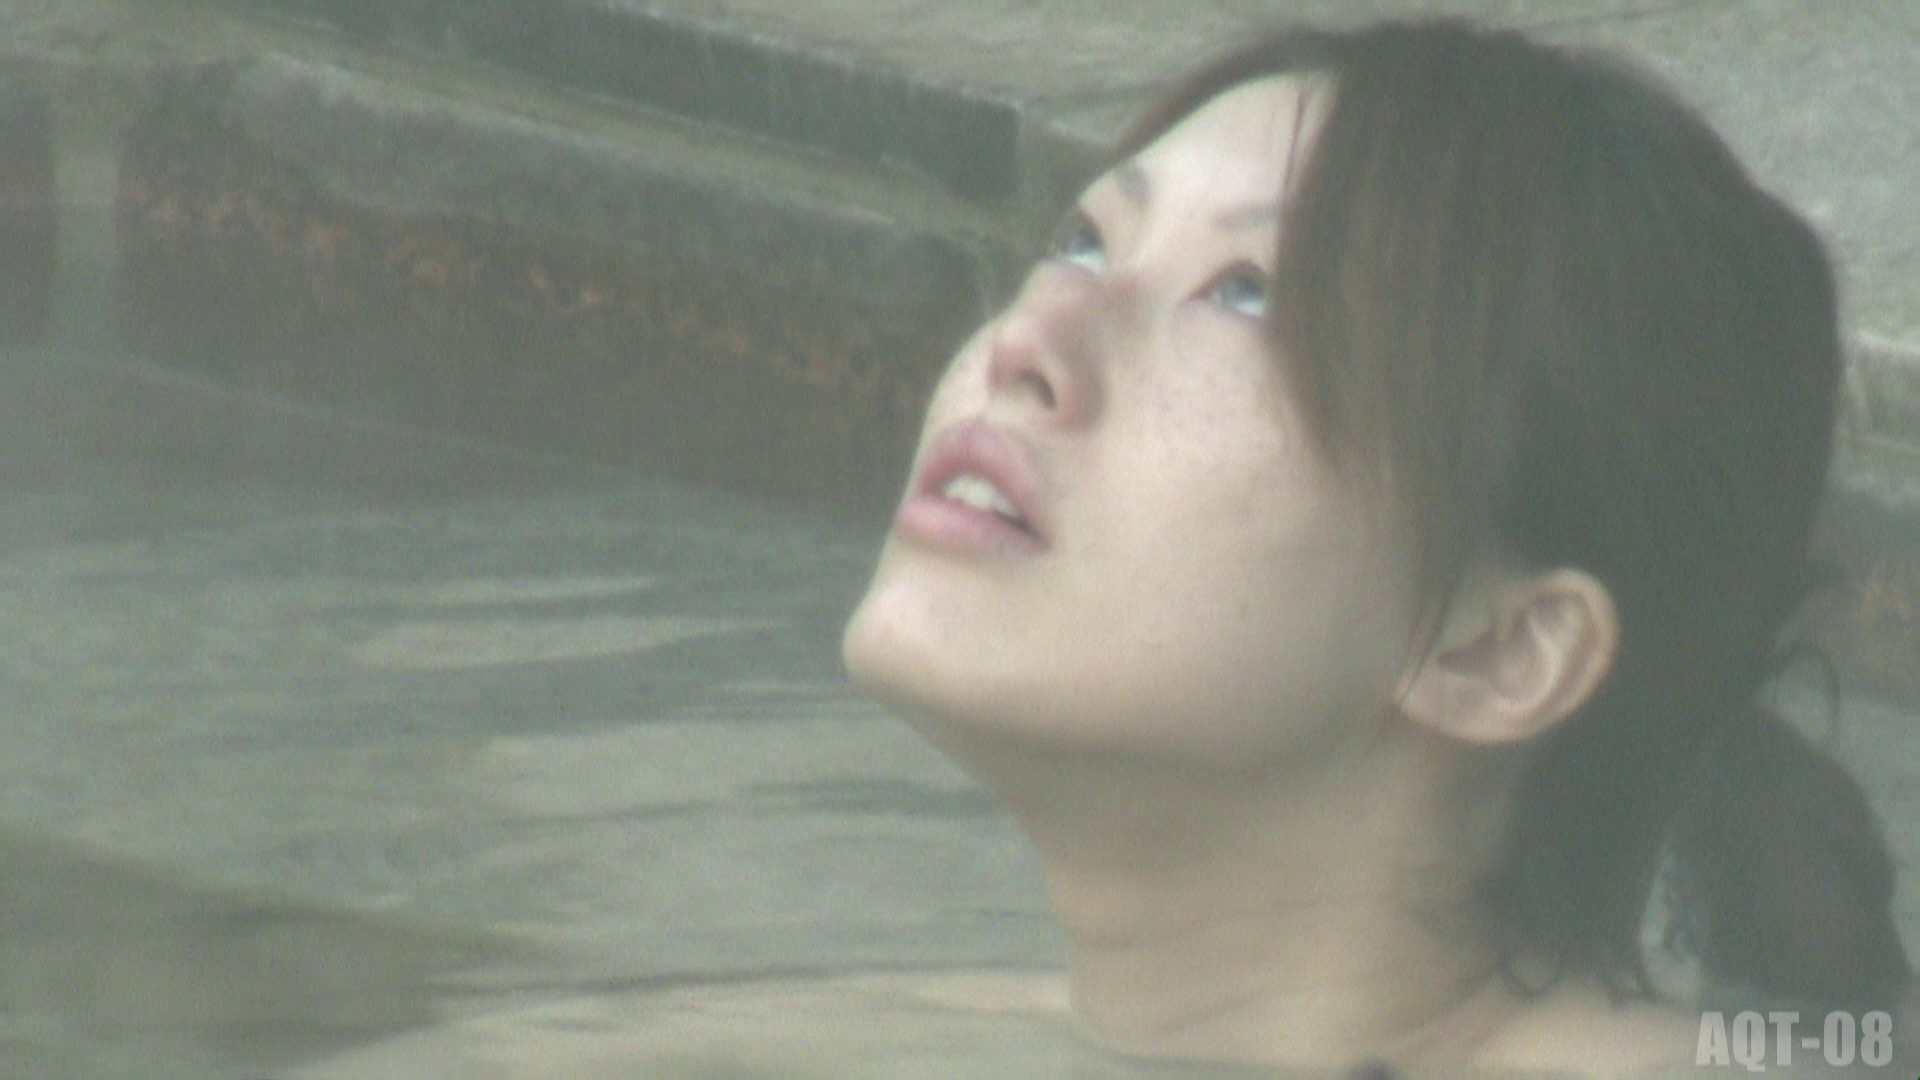 Aquaな露天風呂Vol.775 盗撮師作品 AV無料動画キャプチャ 98pic 44